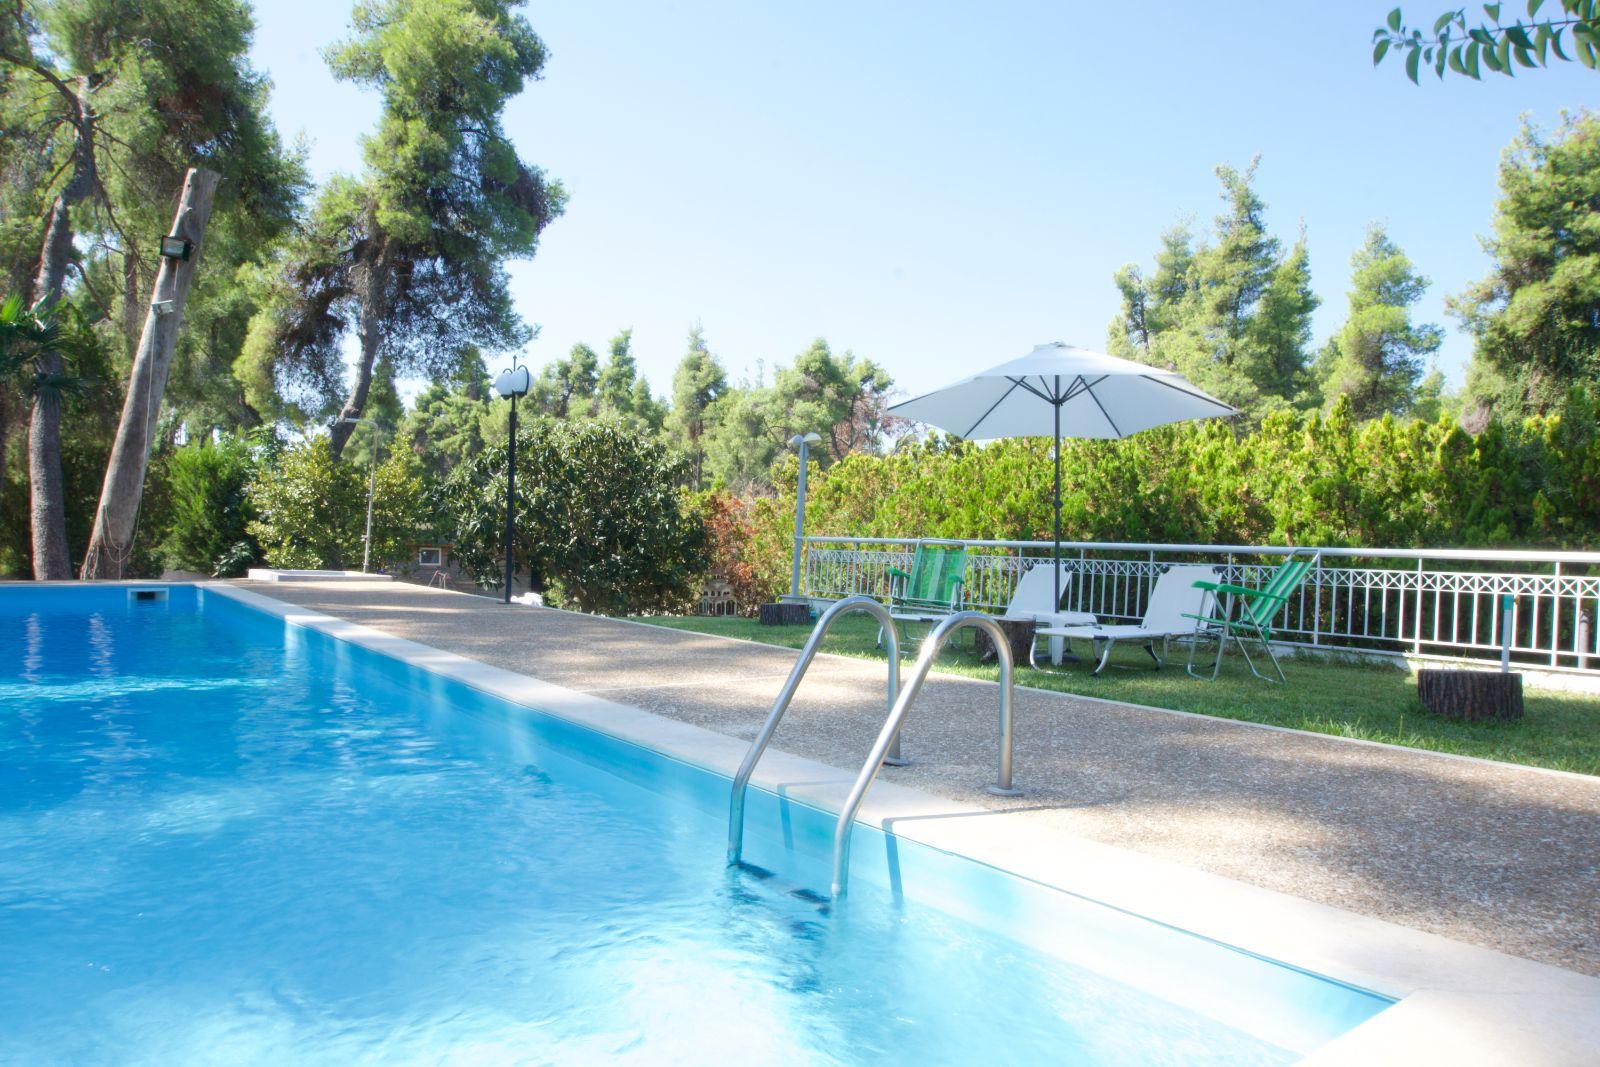 Diamond Swimming Pool